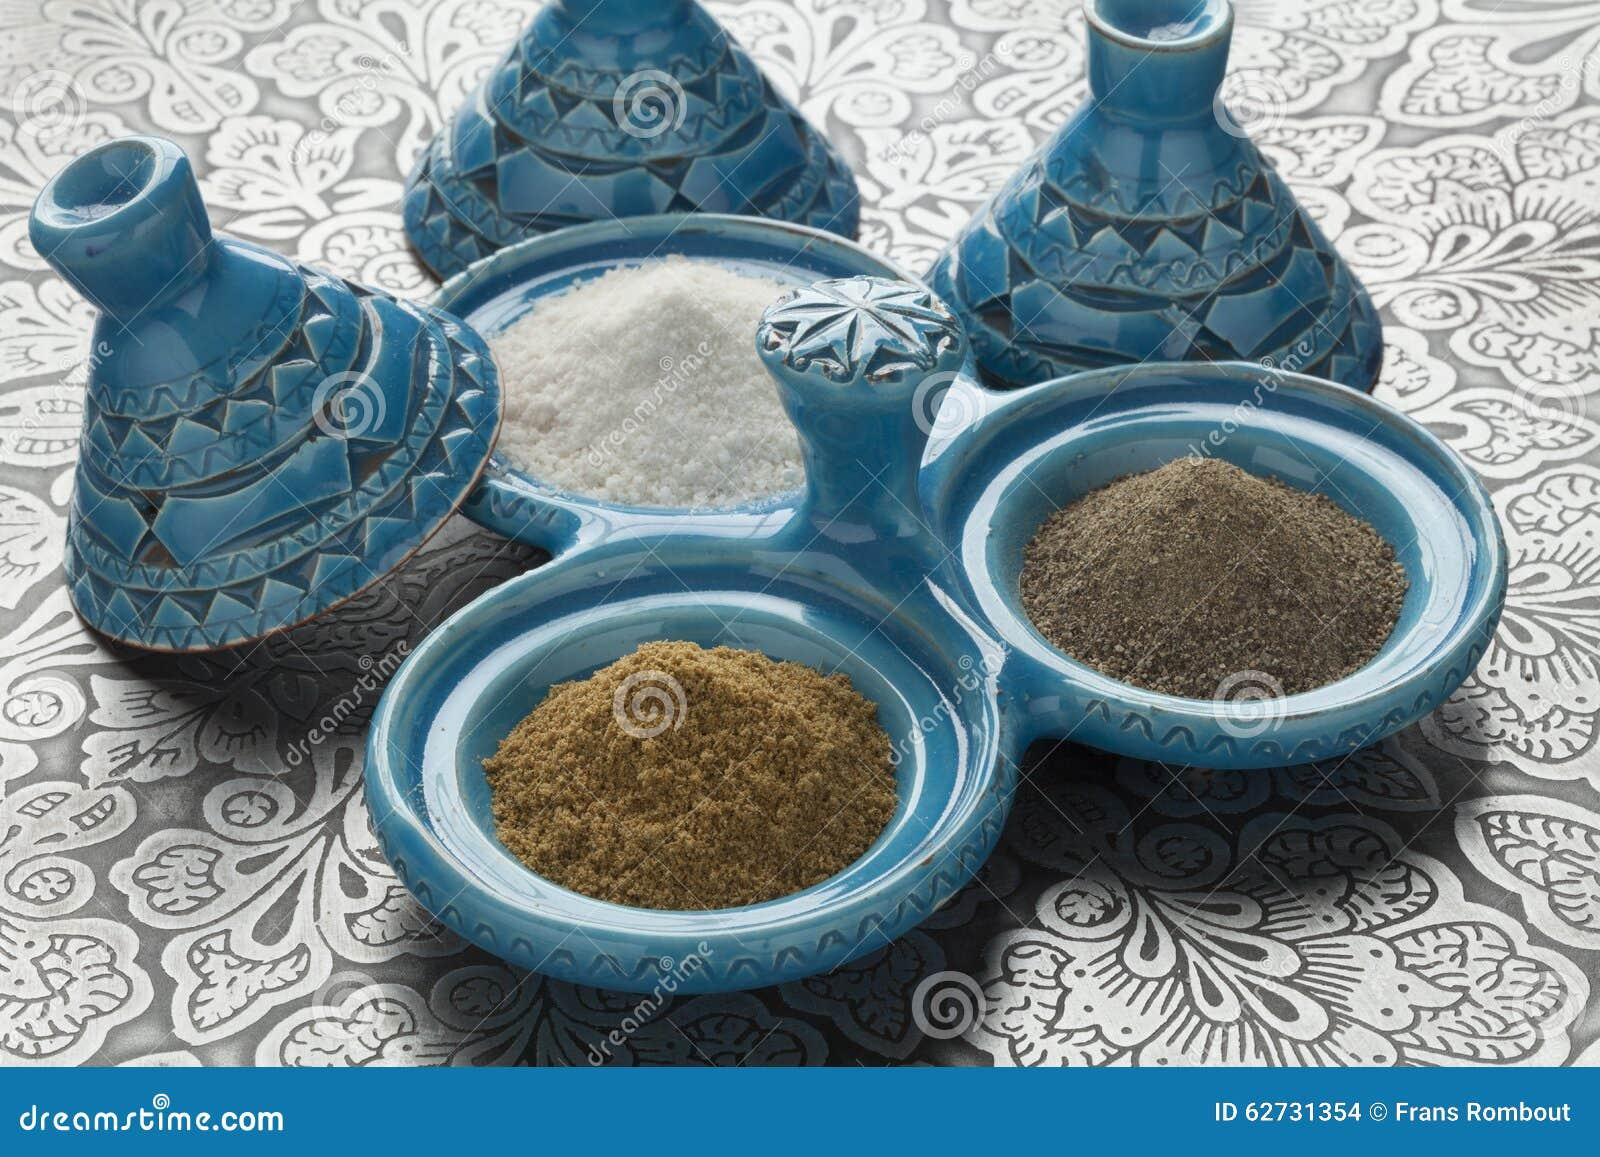 Moroccan Pepper,salt And Cumin Bowl